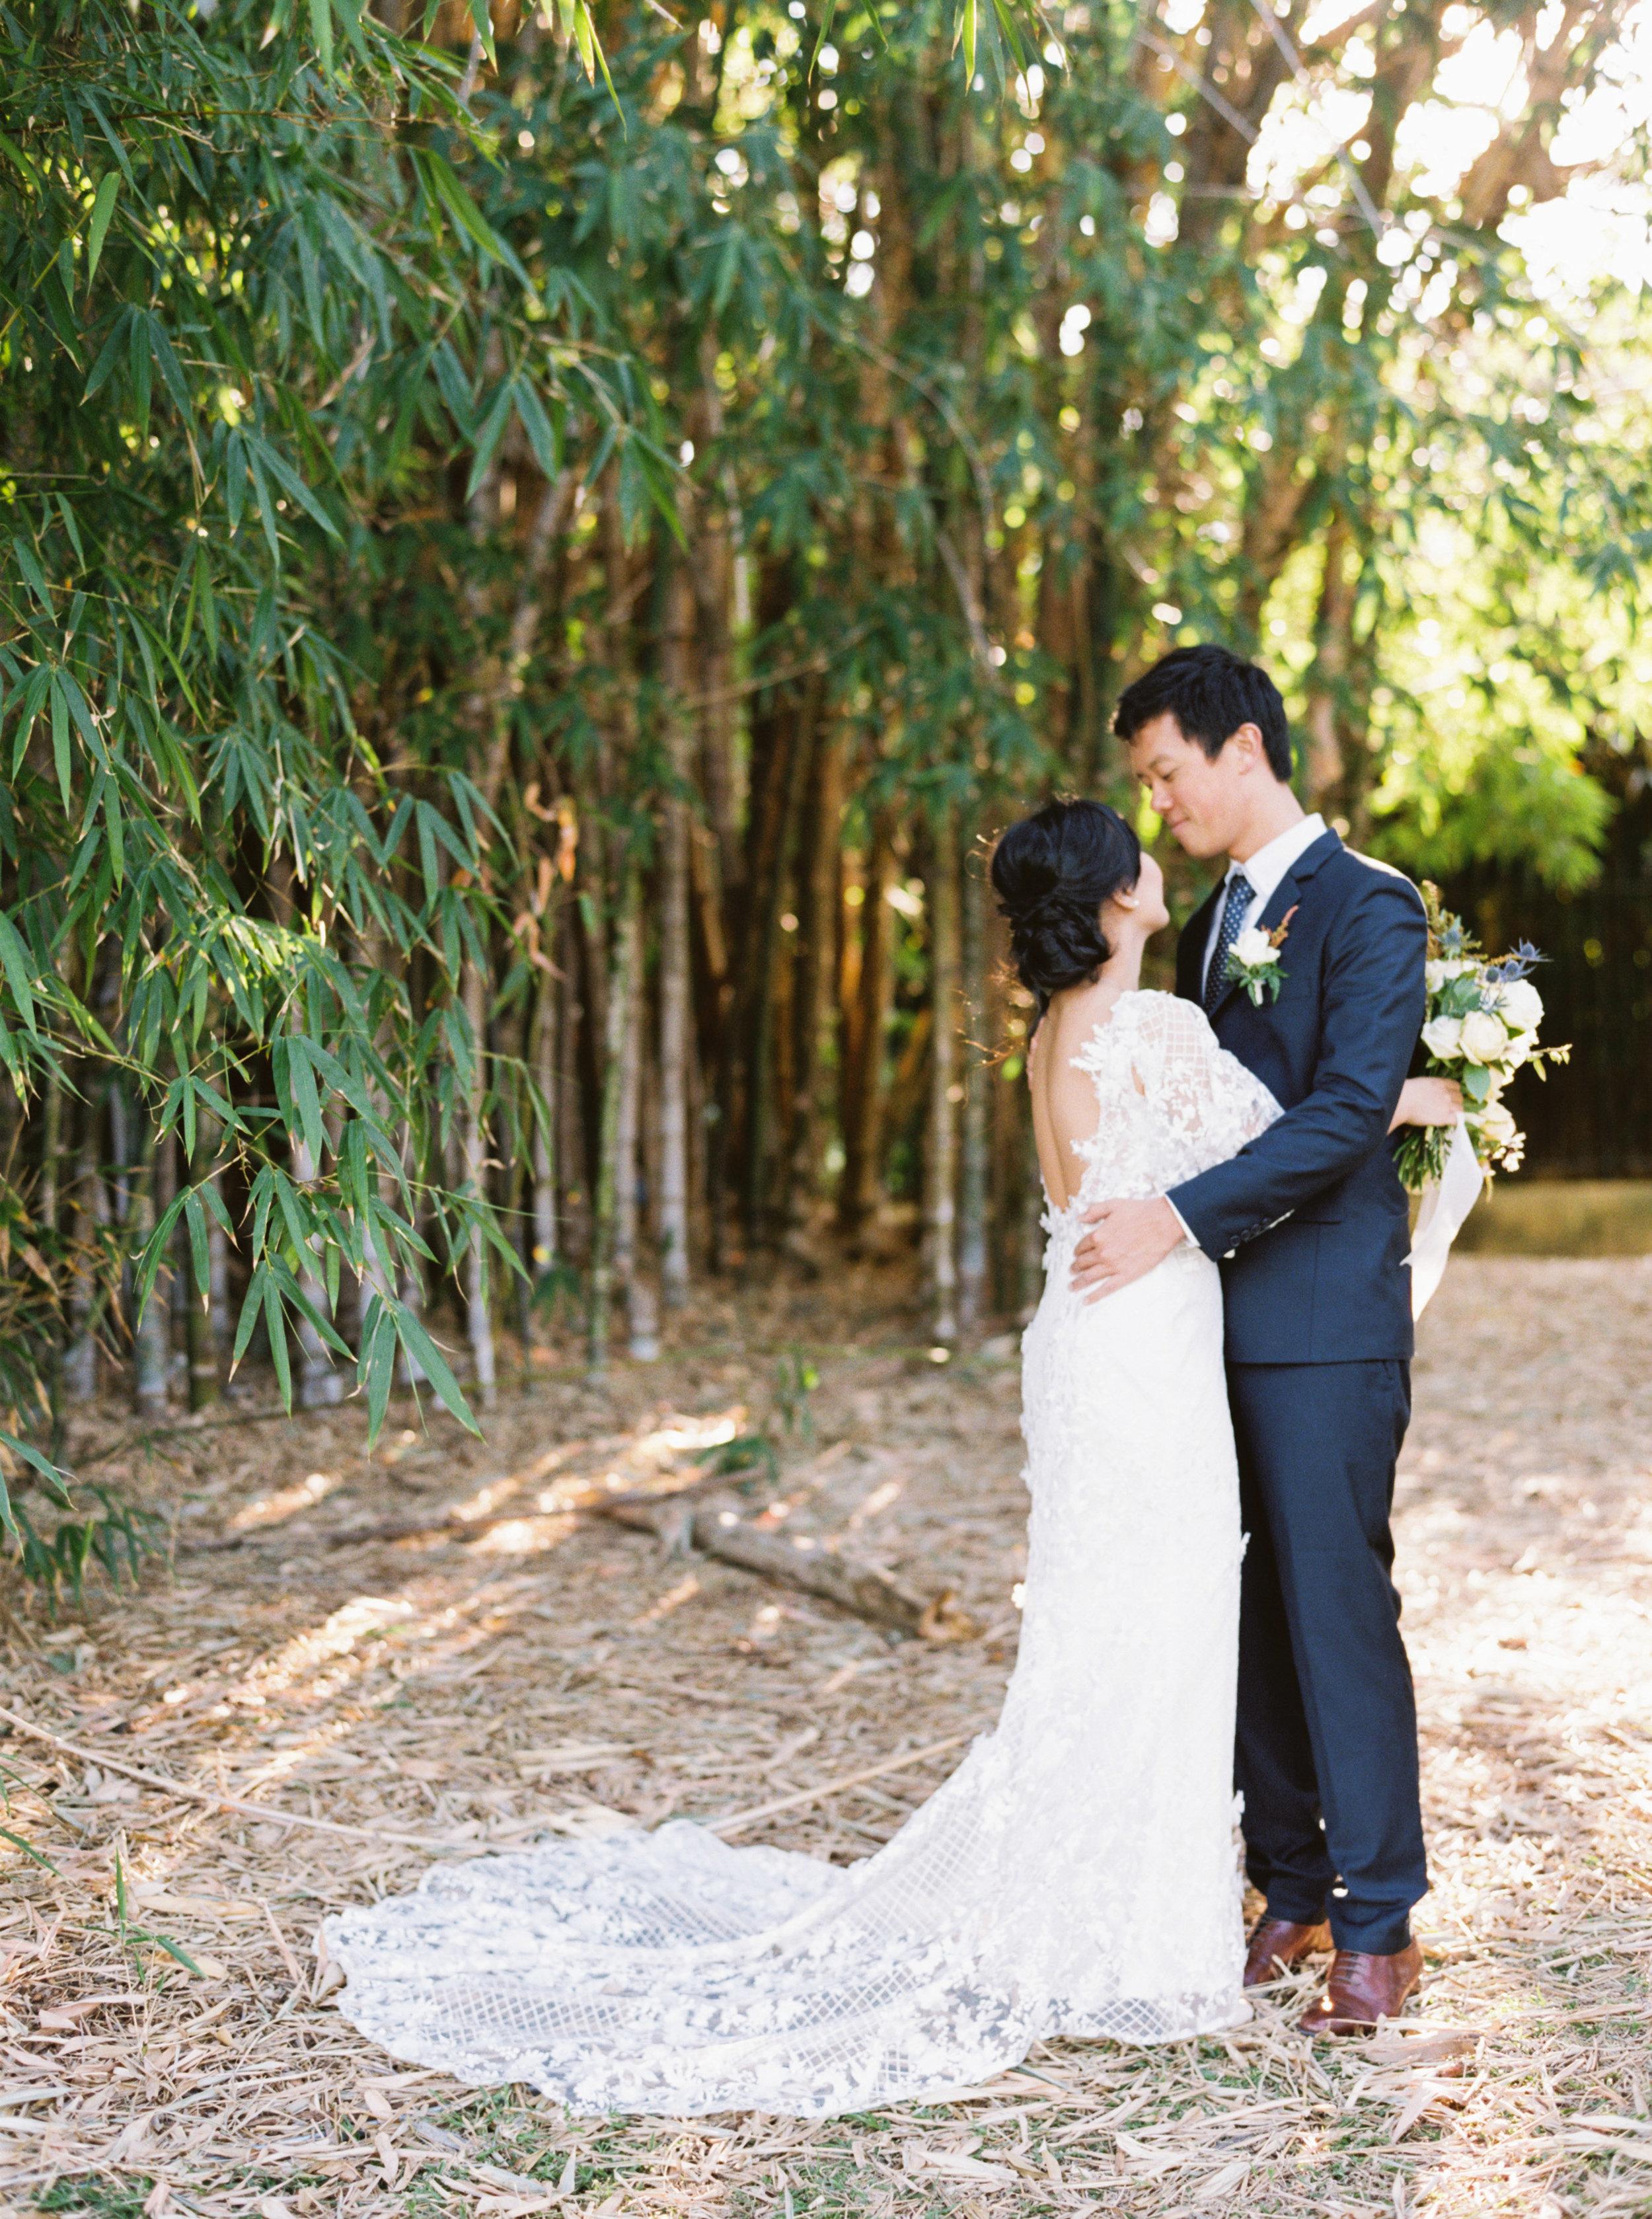 00029- Australia Sydney Wedding Photographer Sheri McMahon.jpg